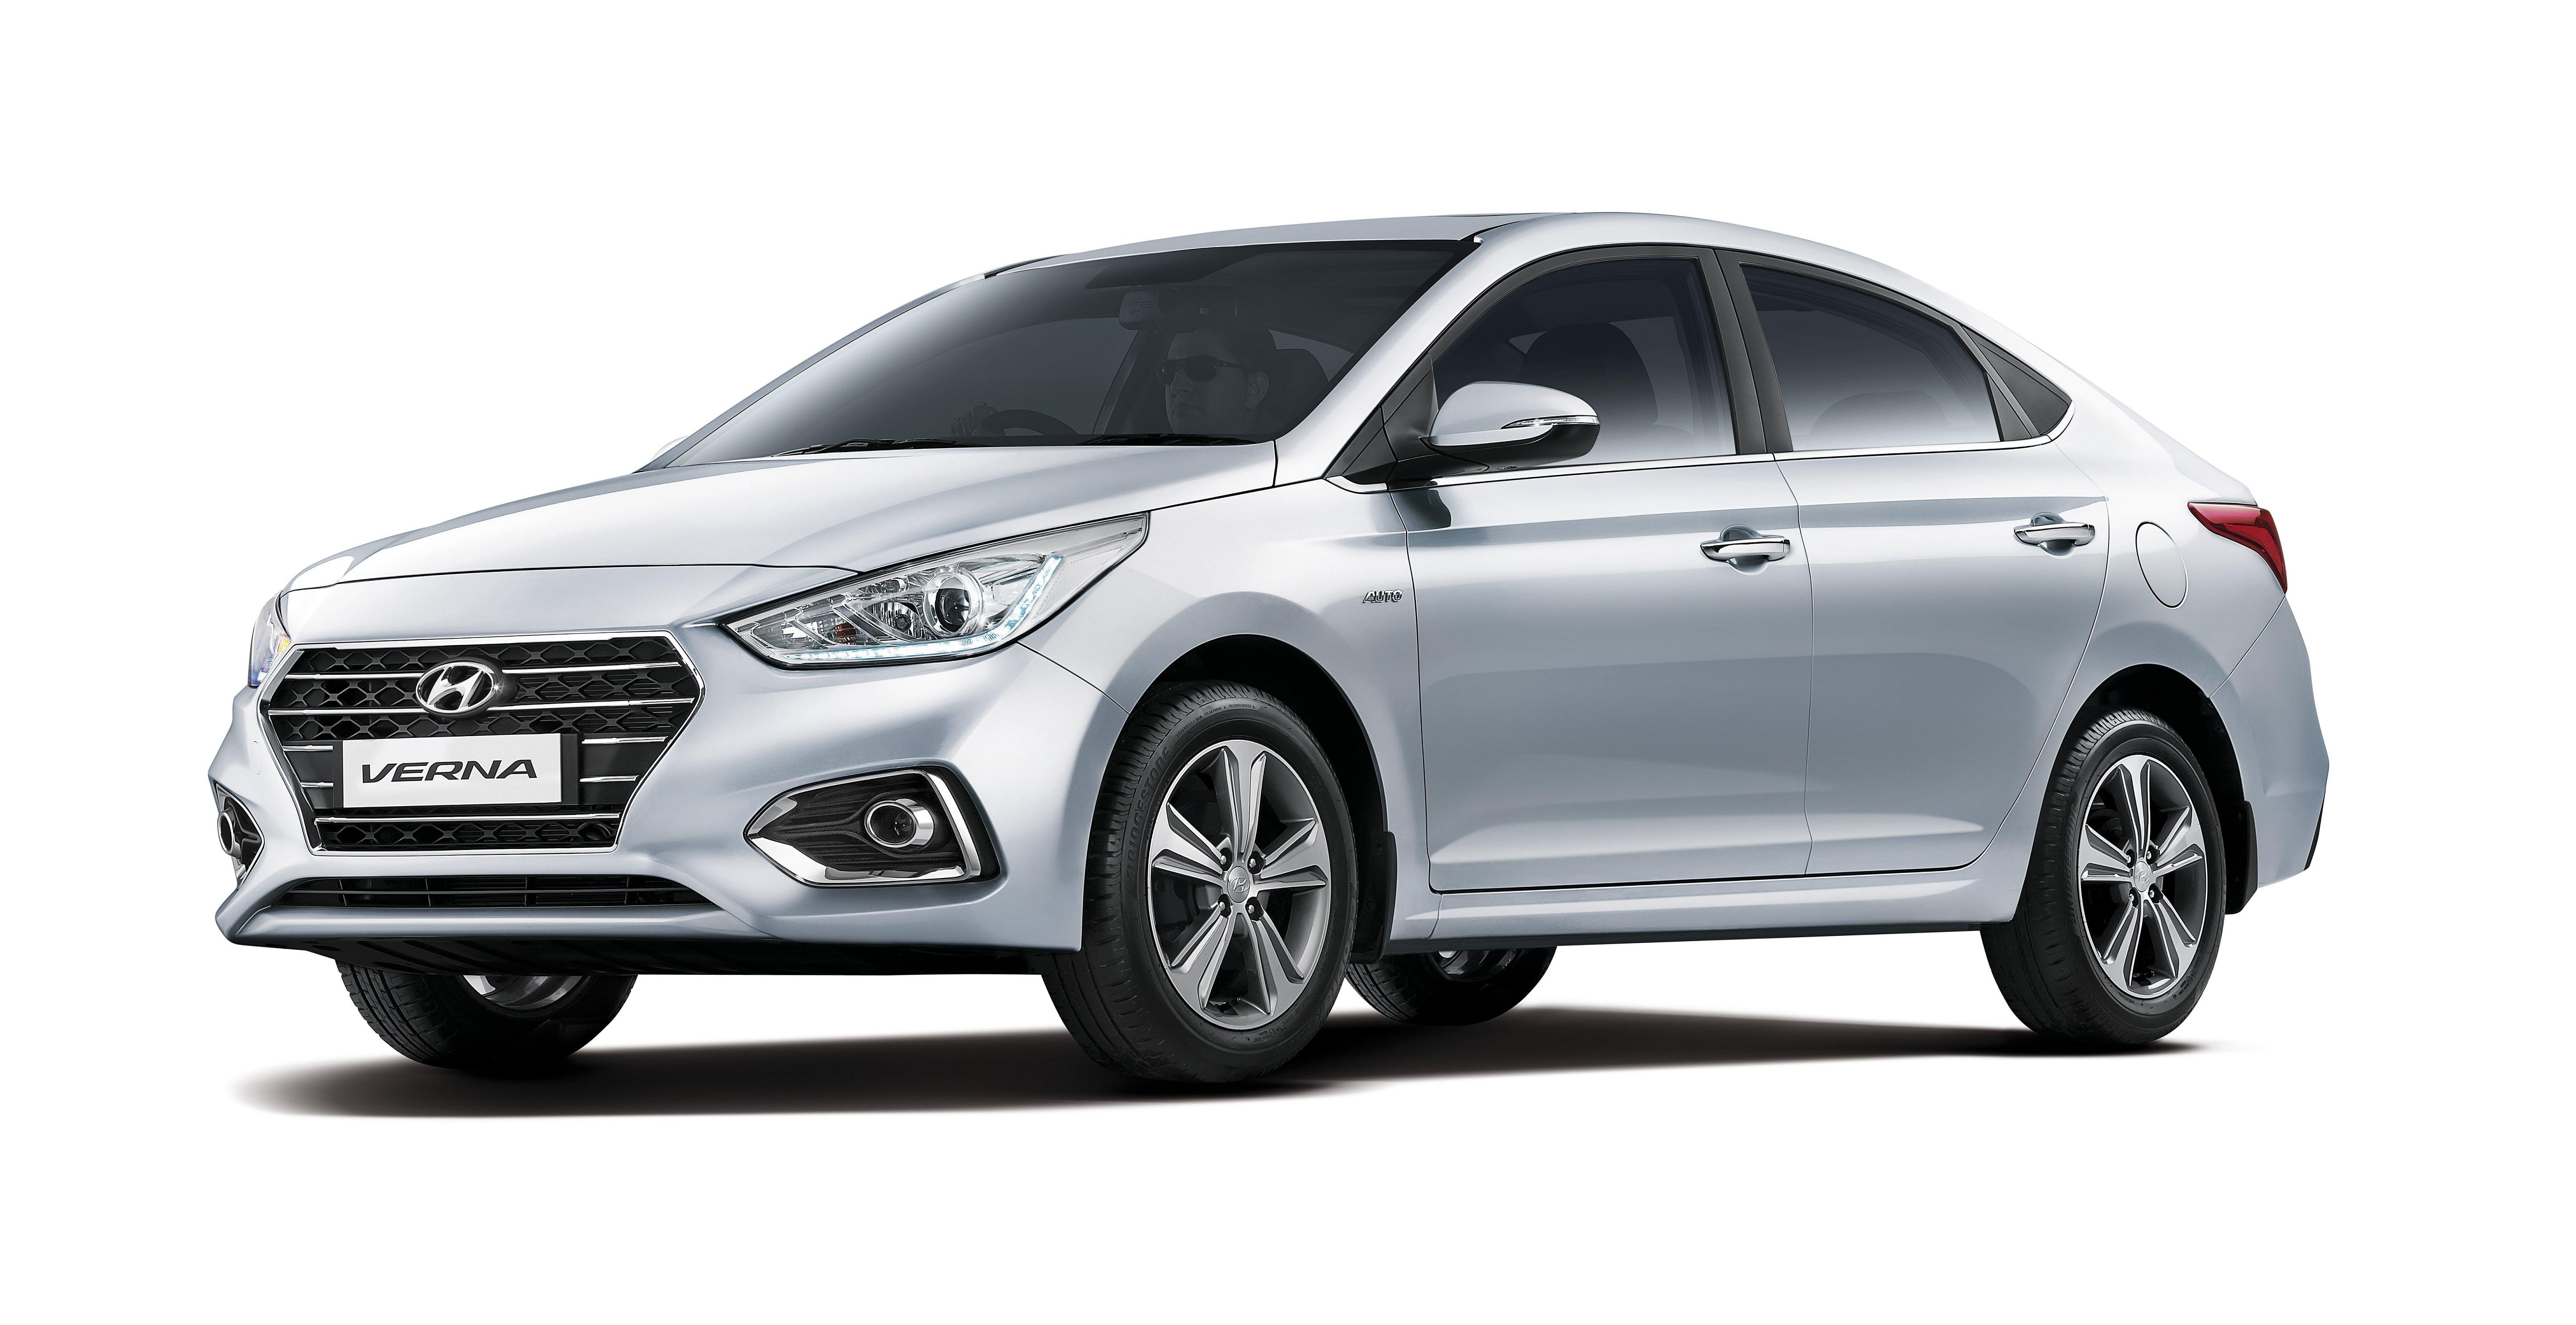 New 2017 Hyundai Verna Vs Honda City Comparison Price